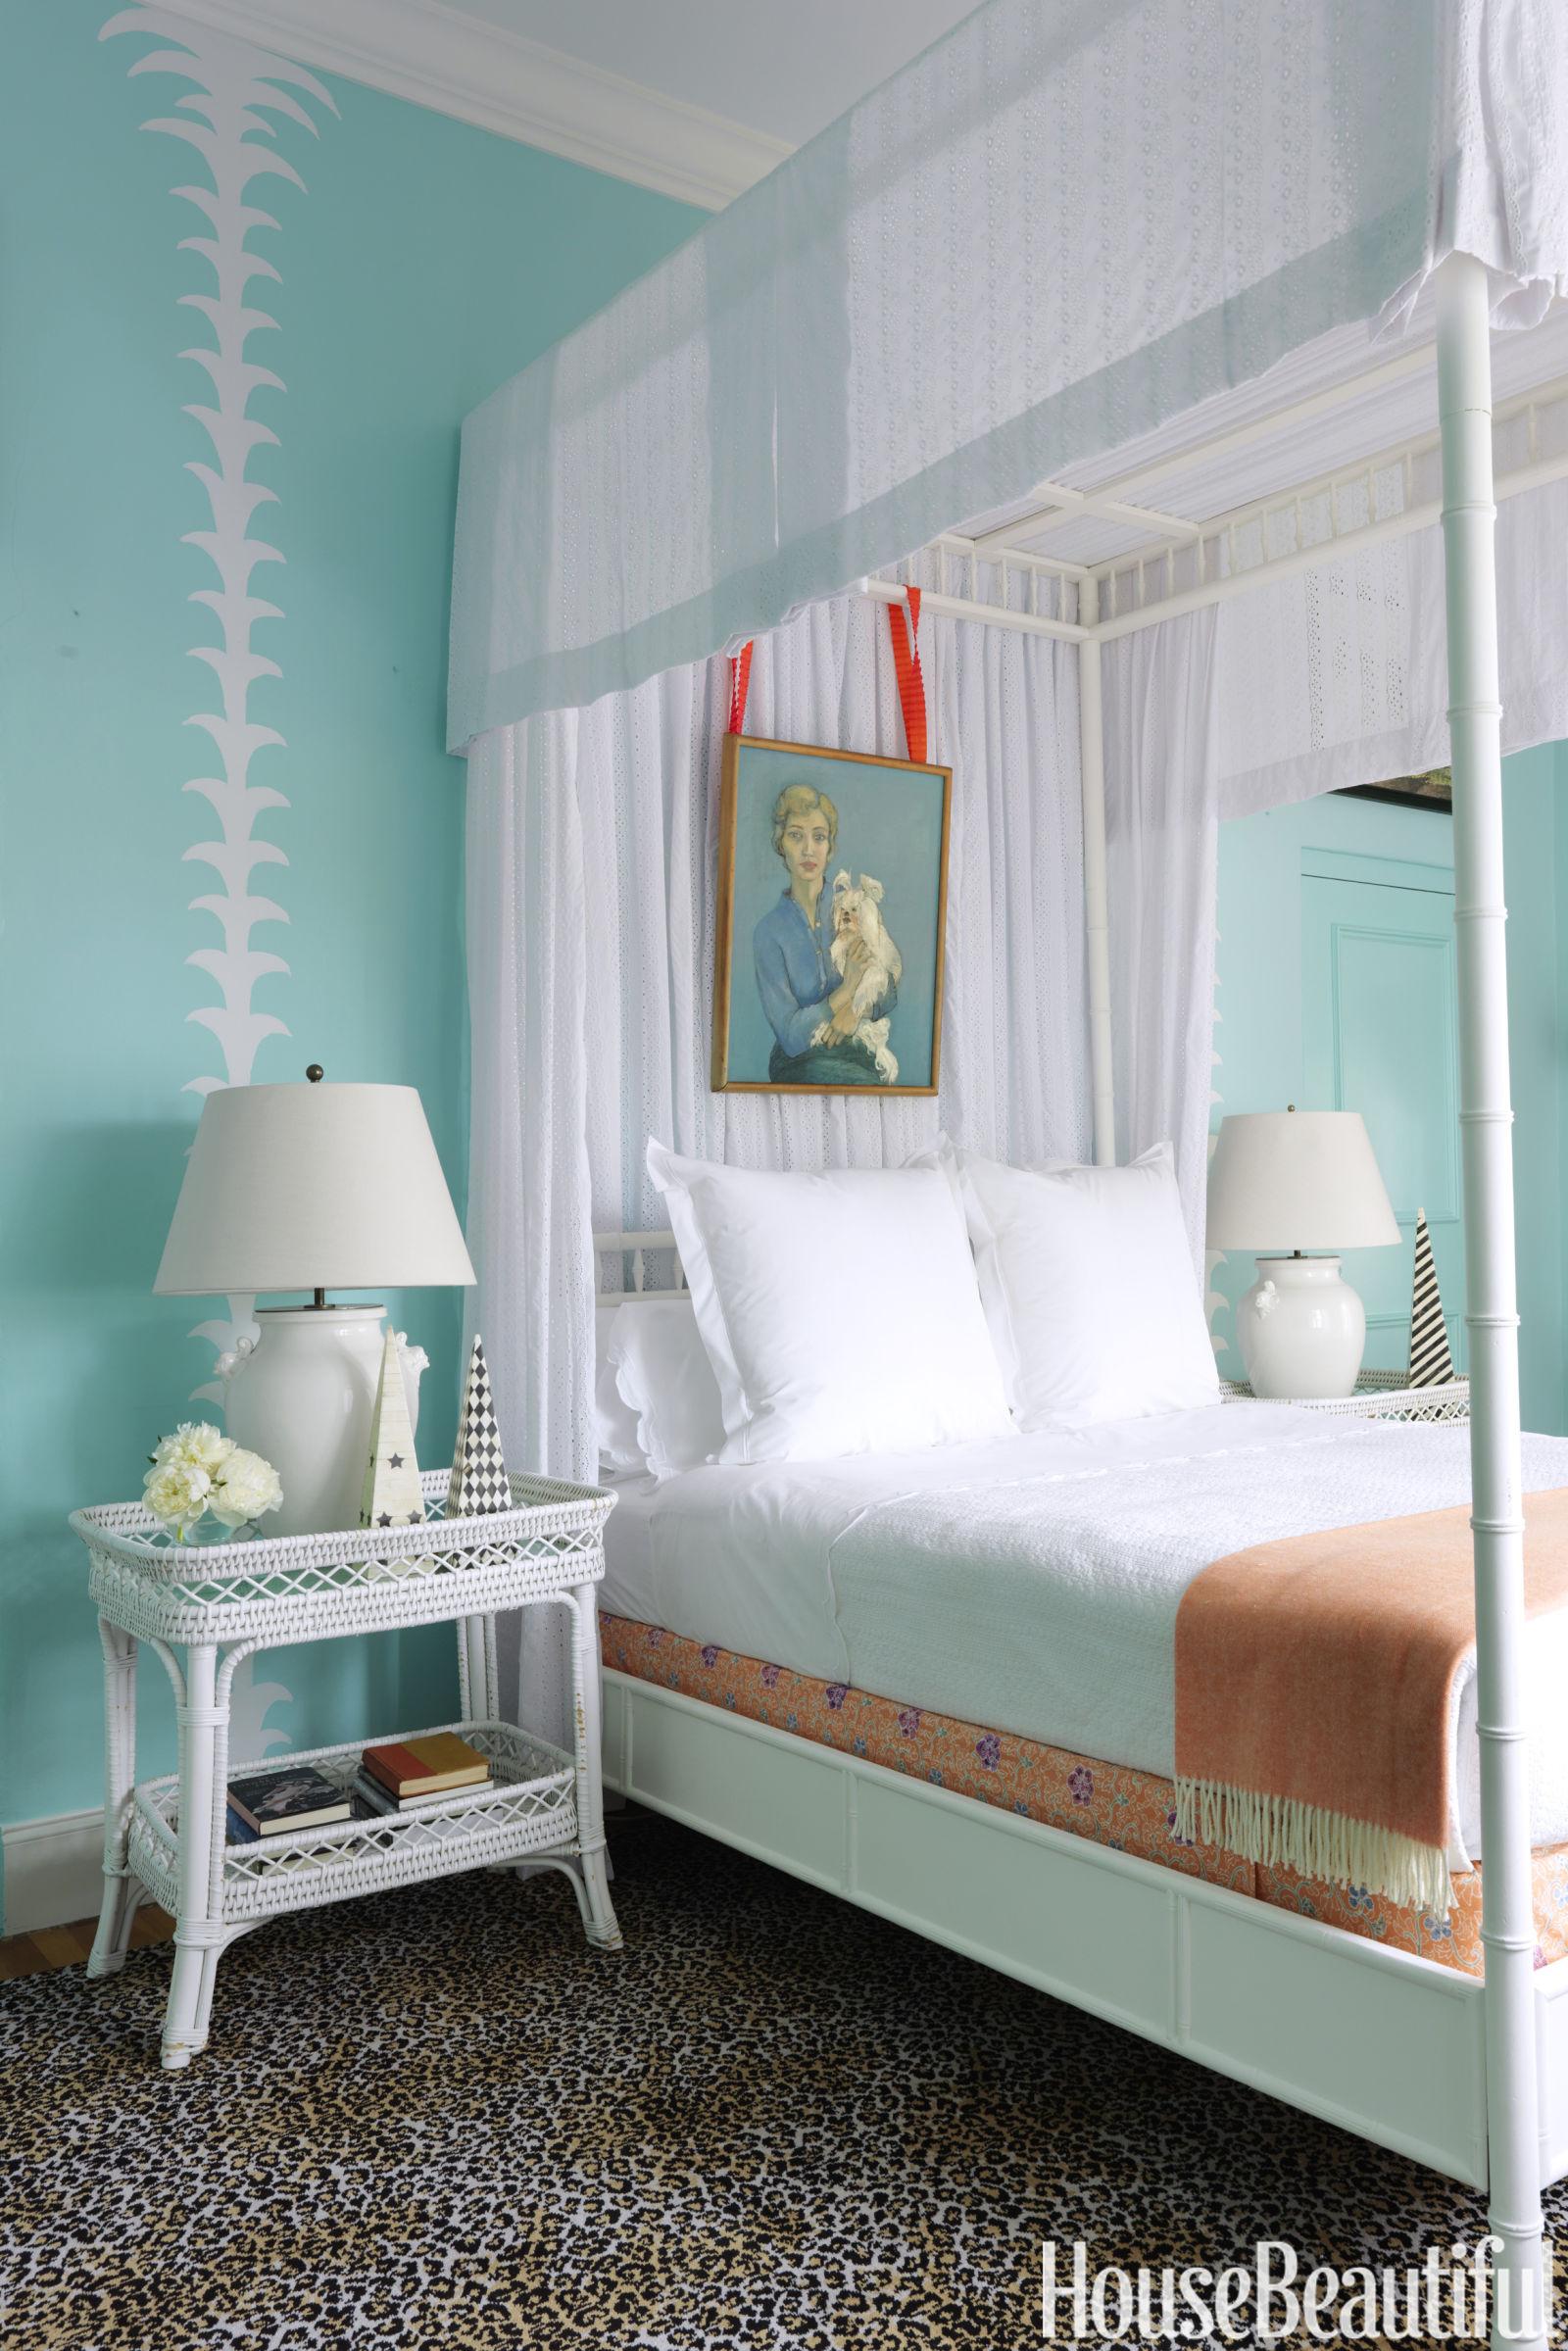 amanda-lindroth-master-bedroom.jpg